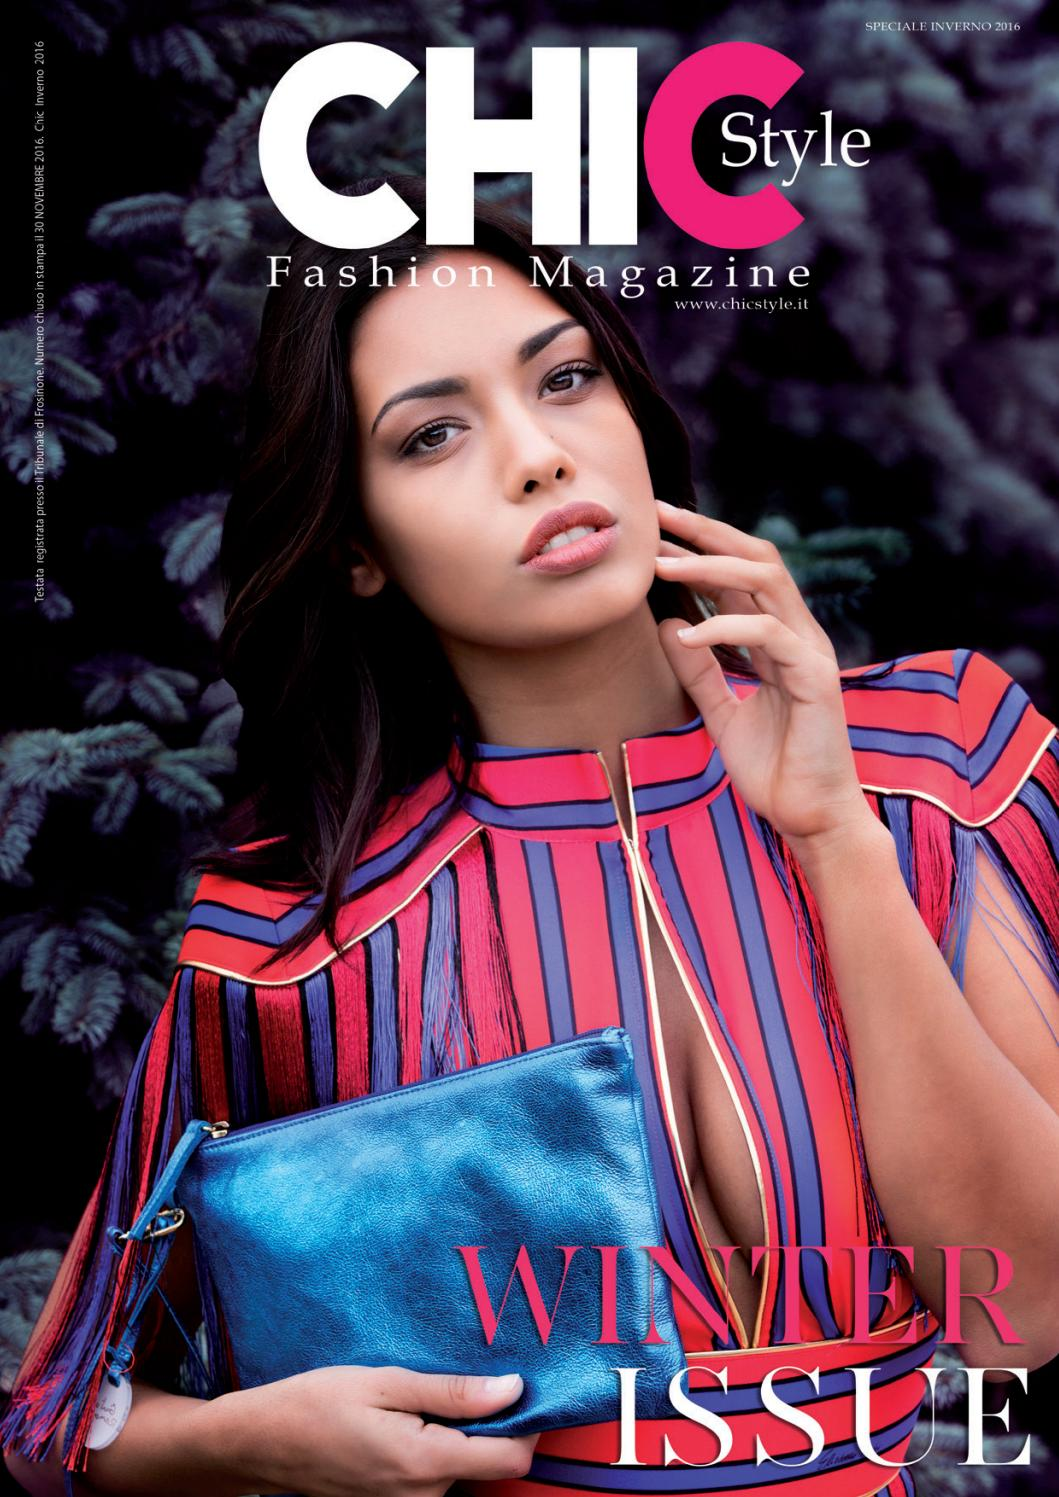 Chic Style Winter 2016 by CHIC STYLE MAGAZINE - issuu 454f8cfdc53